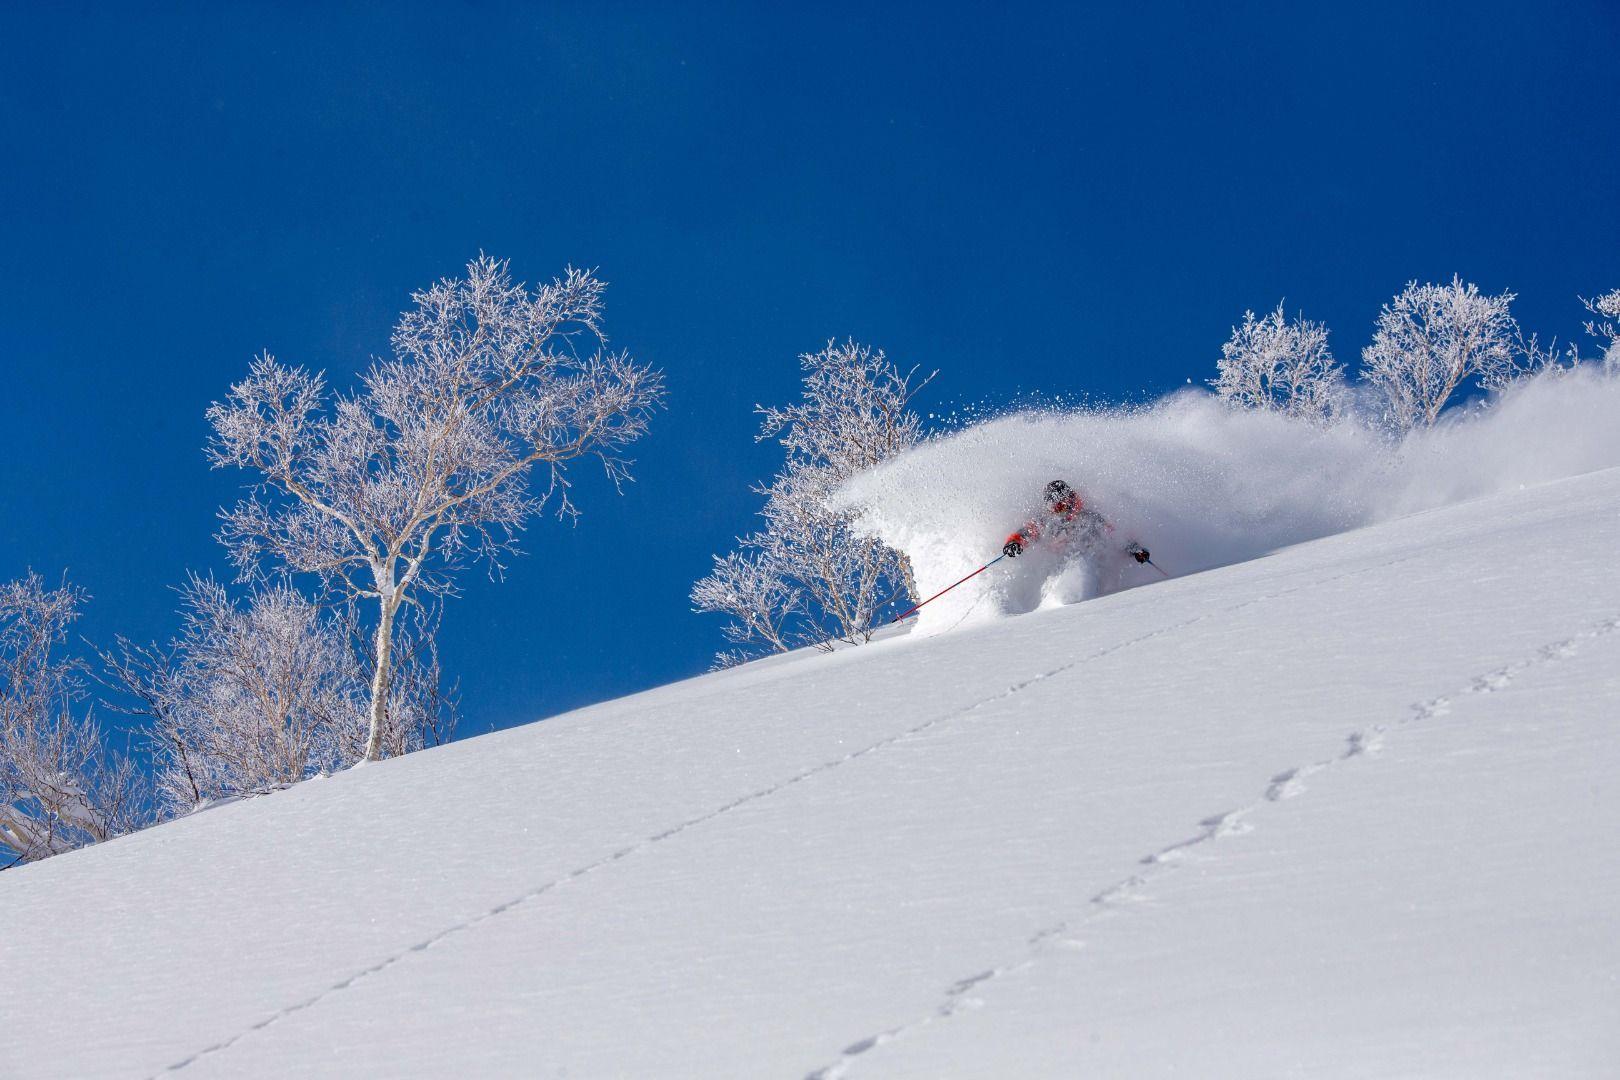 Winter Snow Ryuoo Ski Park (Nagano)